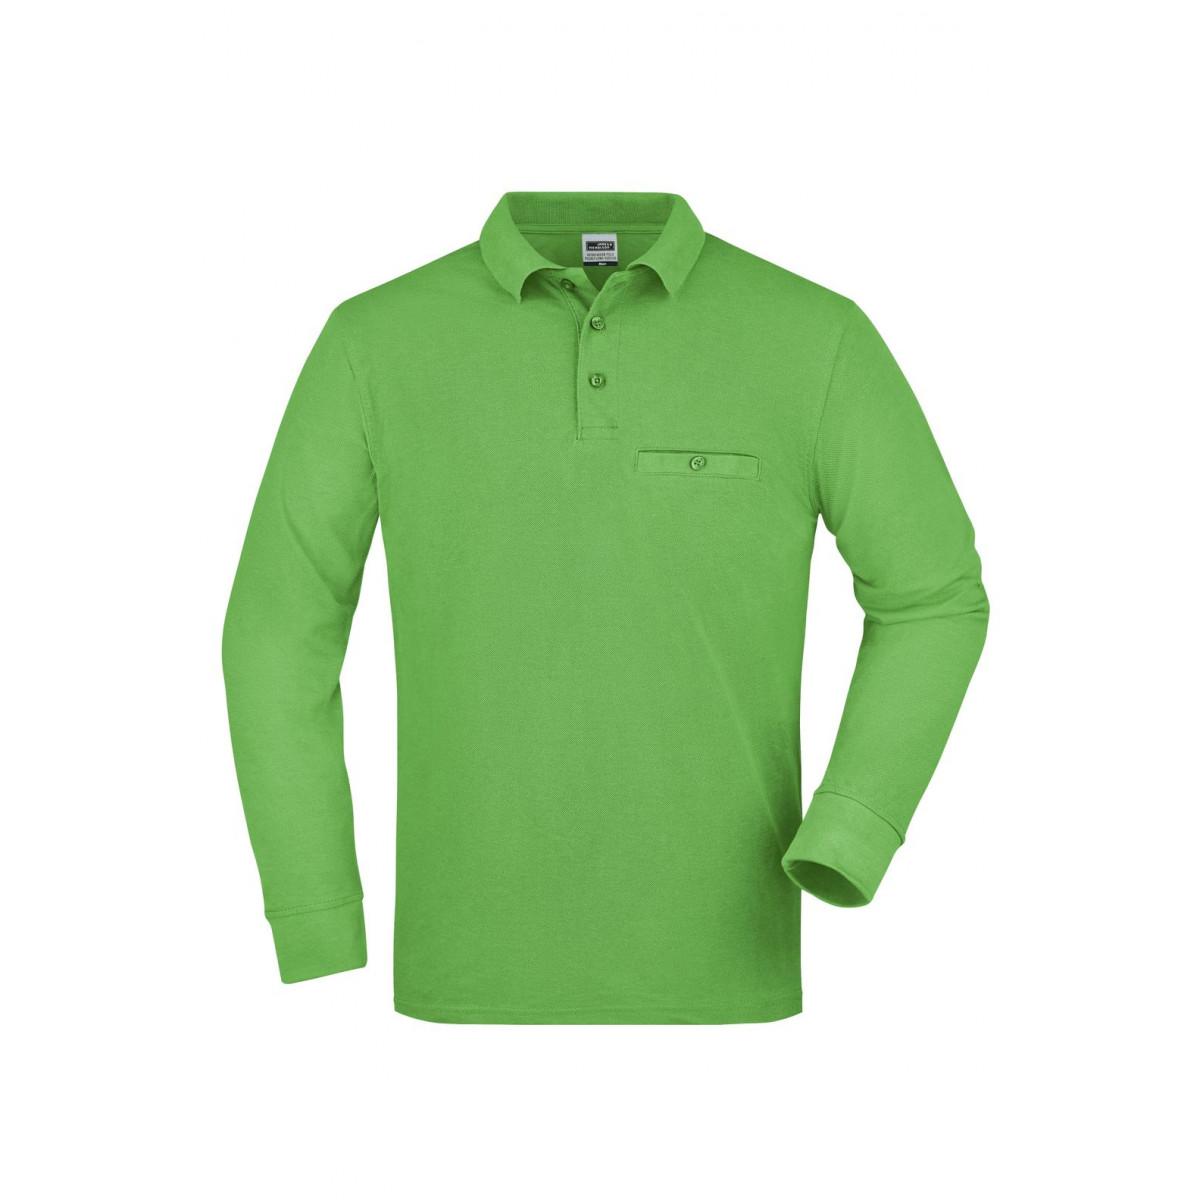 Рубашка поло мужская JN866 Mens Workwear Polo Pocket Longsleeve - Лайм